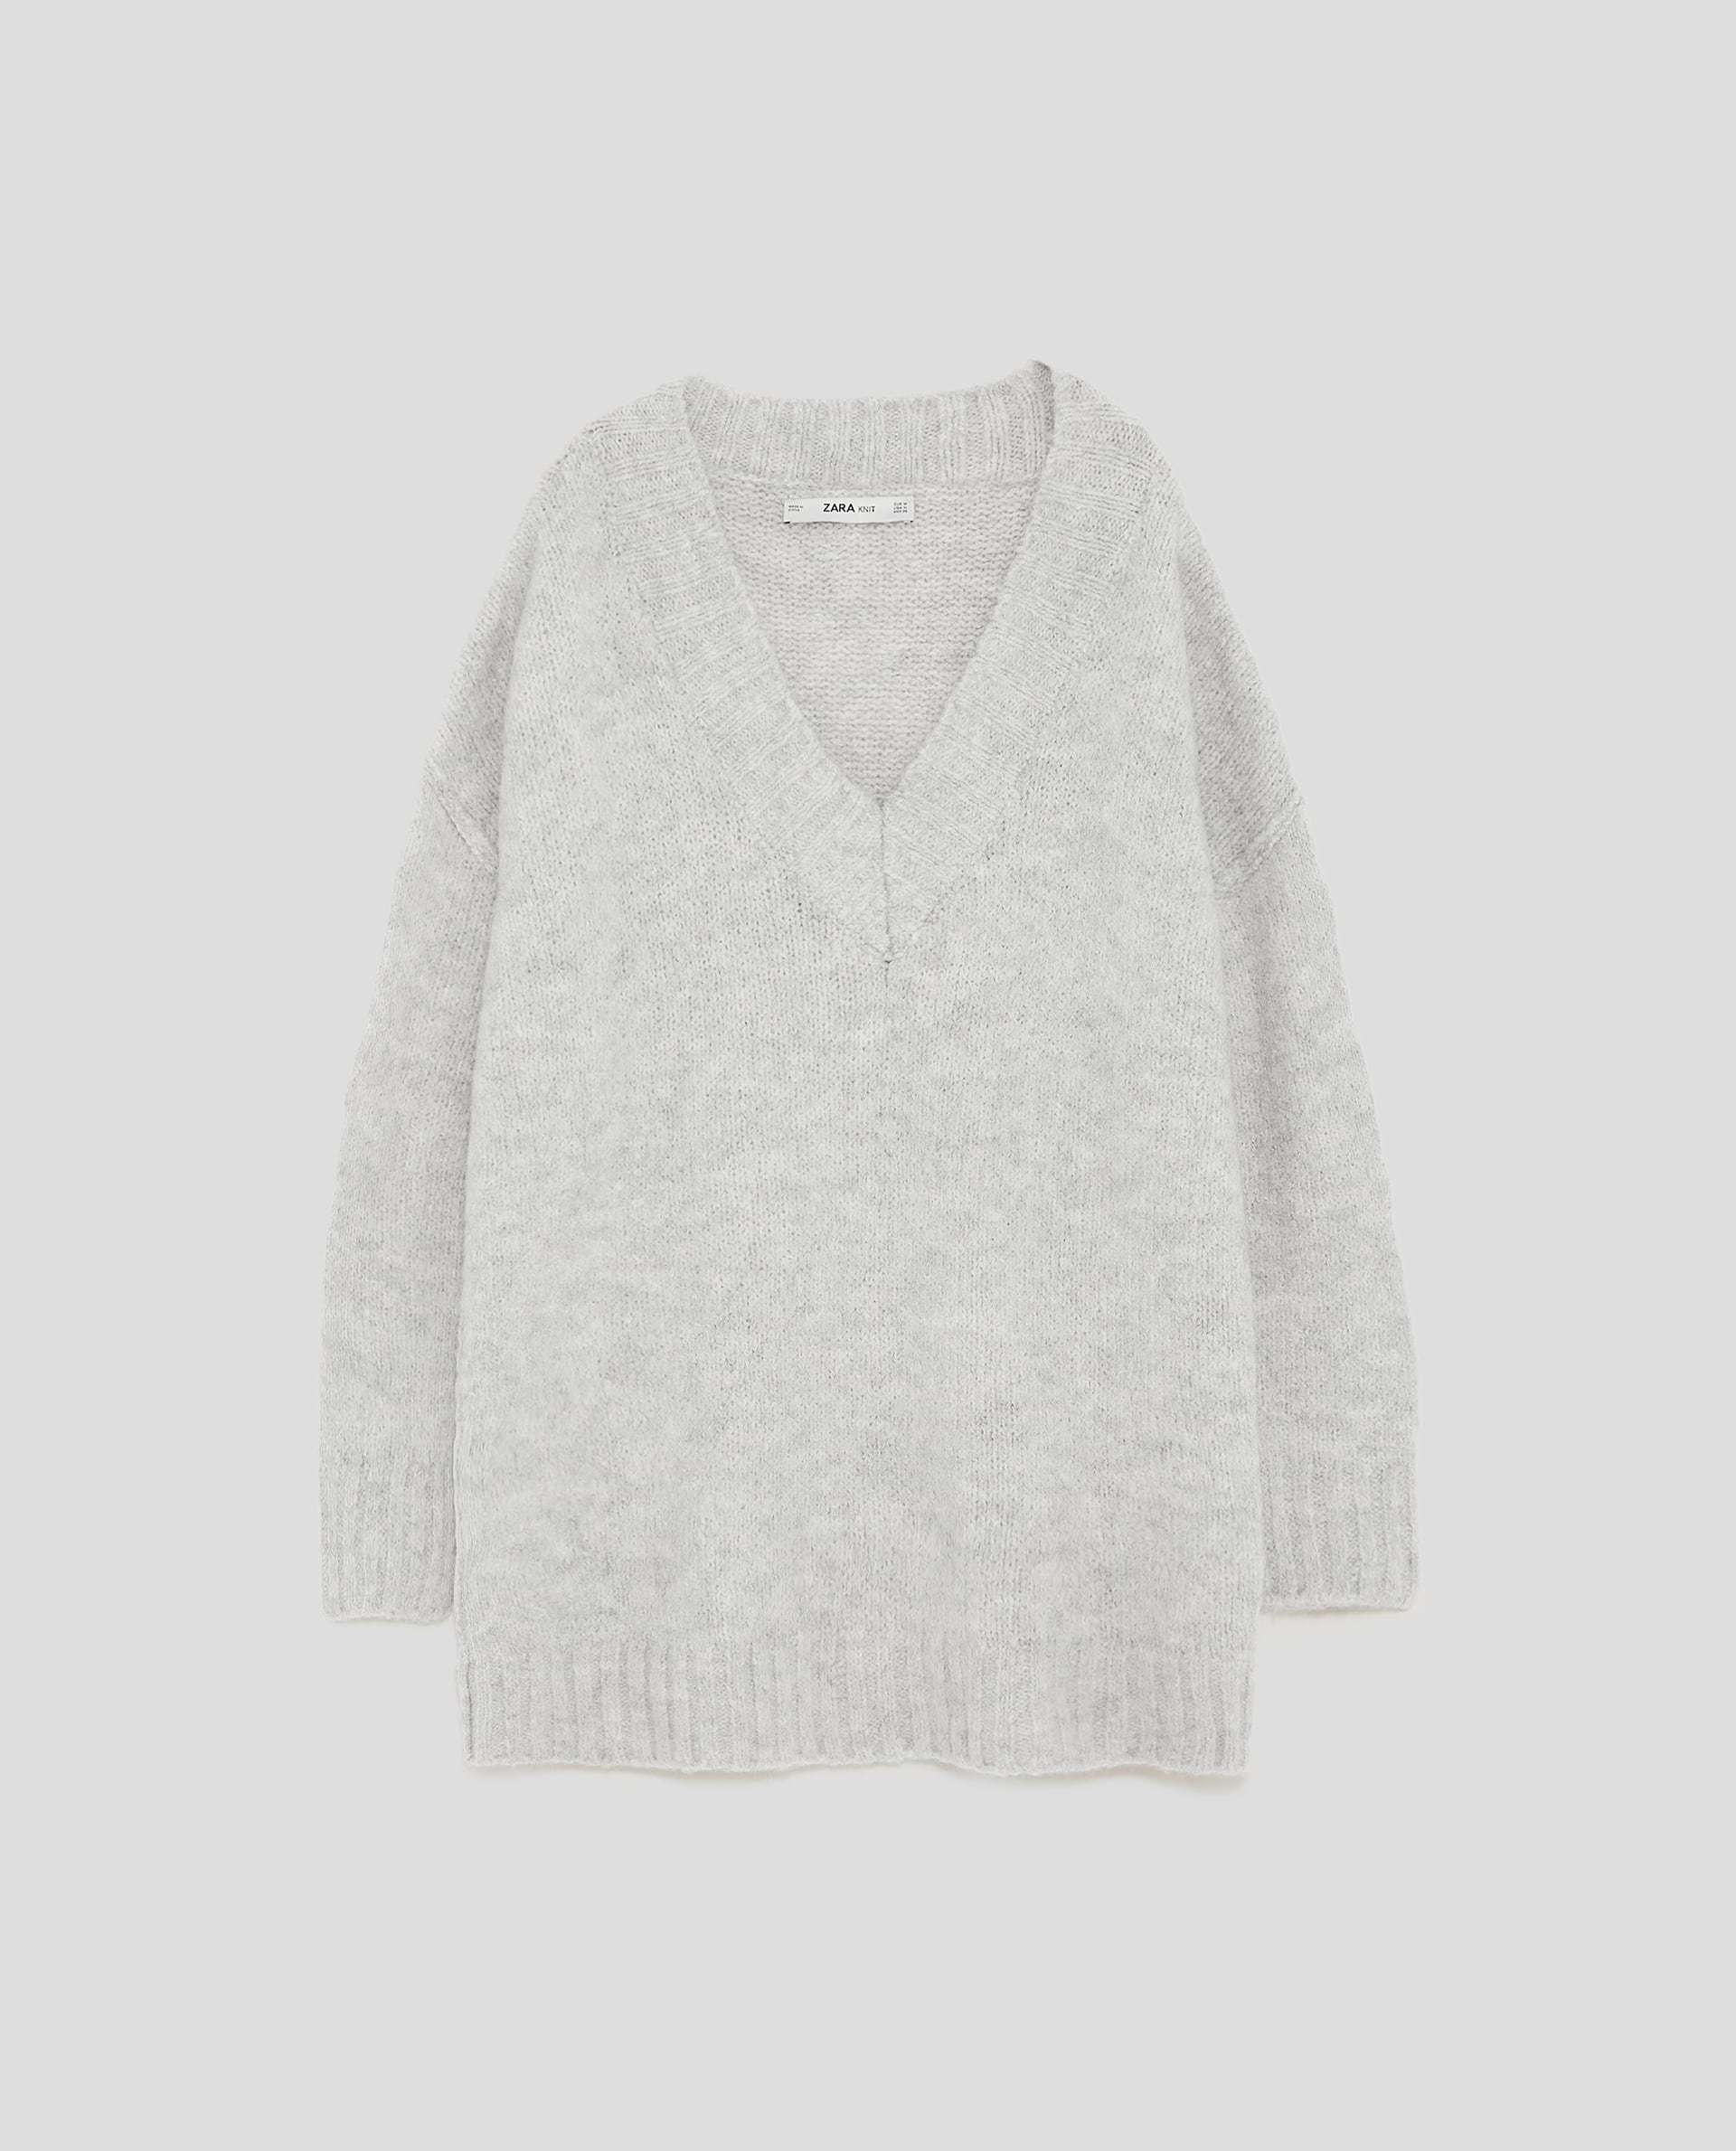 Jersey oversize gris de Zara (29,95 euros)